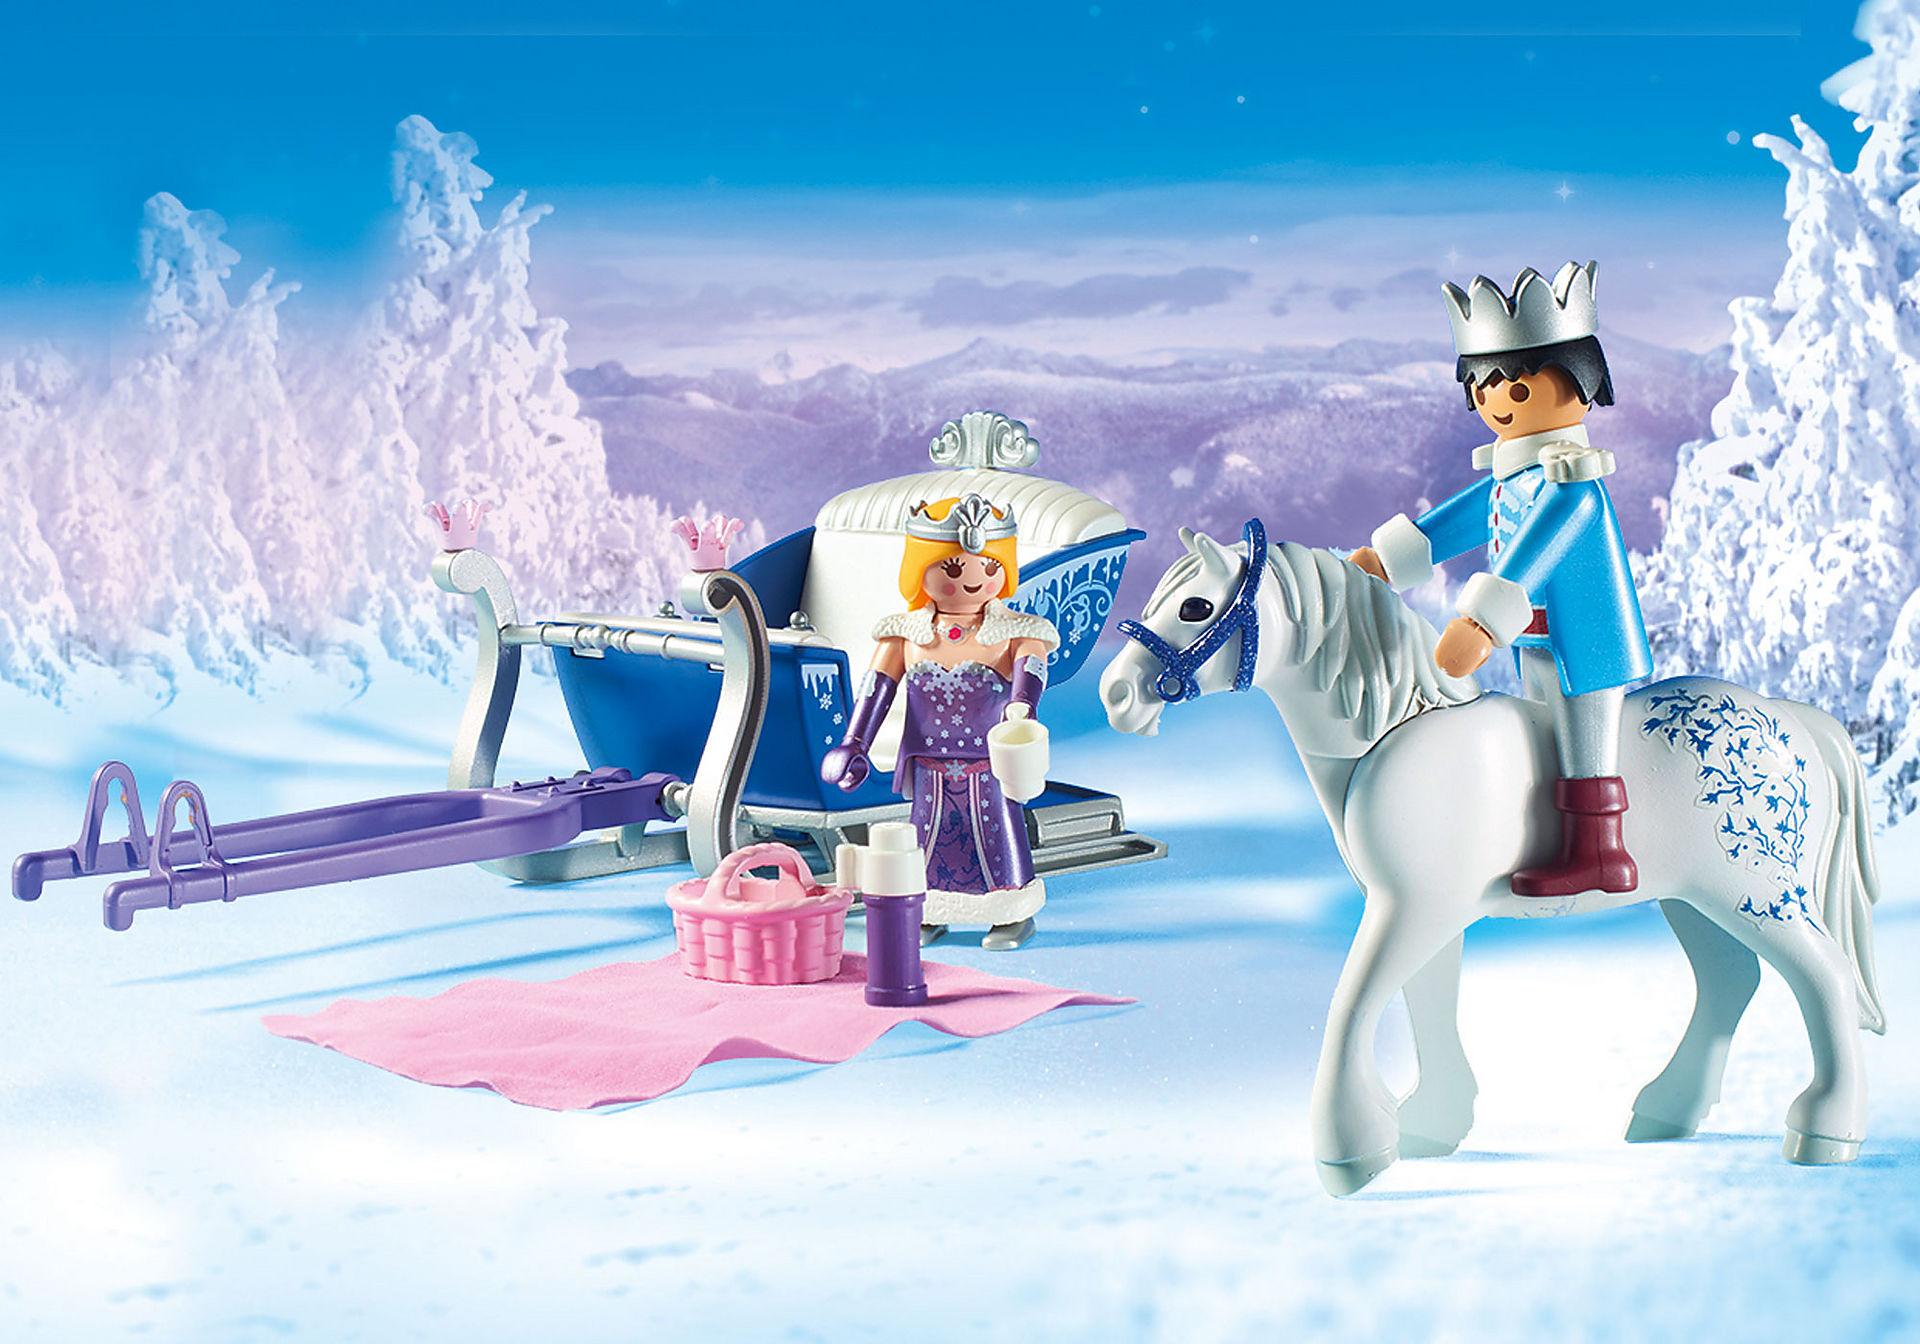 http://media.playmobil.com/i/playmobil/9474_product_extra1/Έλκηθρο με βασιλικό ζευγάρι